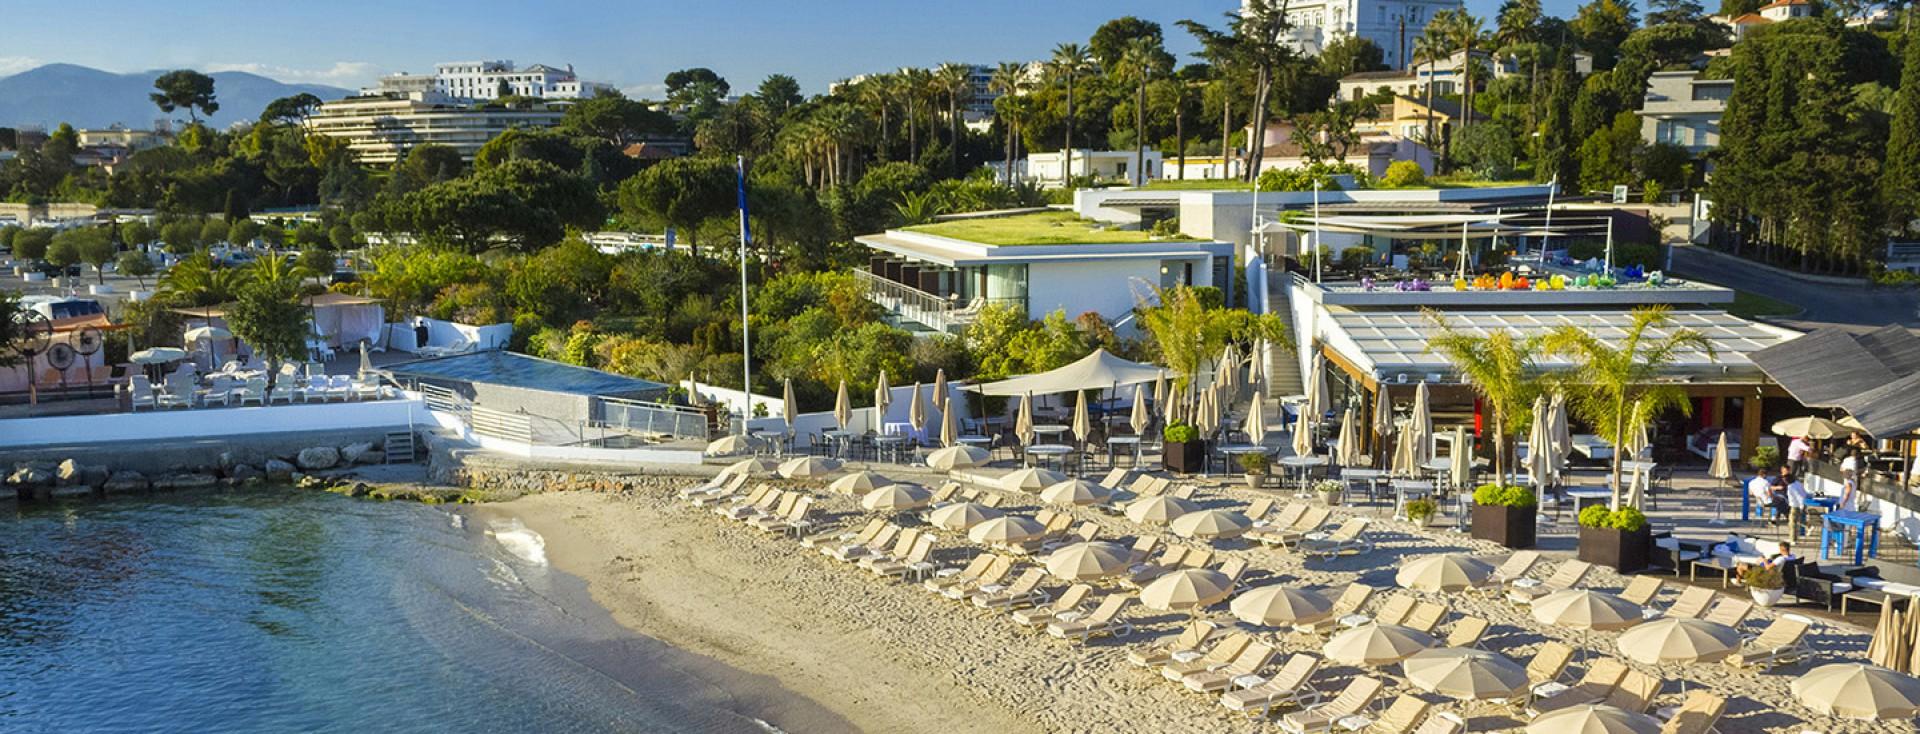 Cap D U2019antibes Beach Hotel  H U00f4tel De Luxe Sur La C U00f4te D